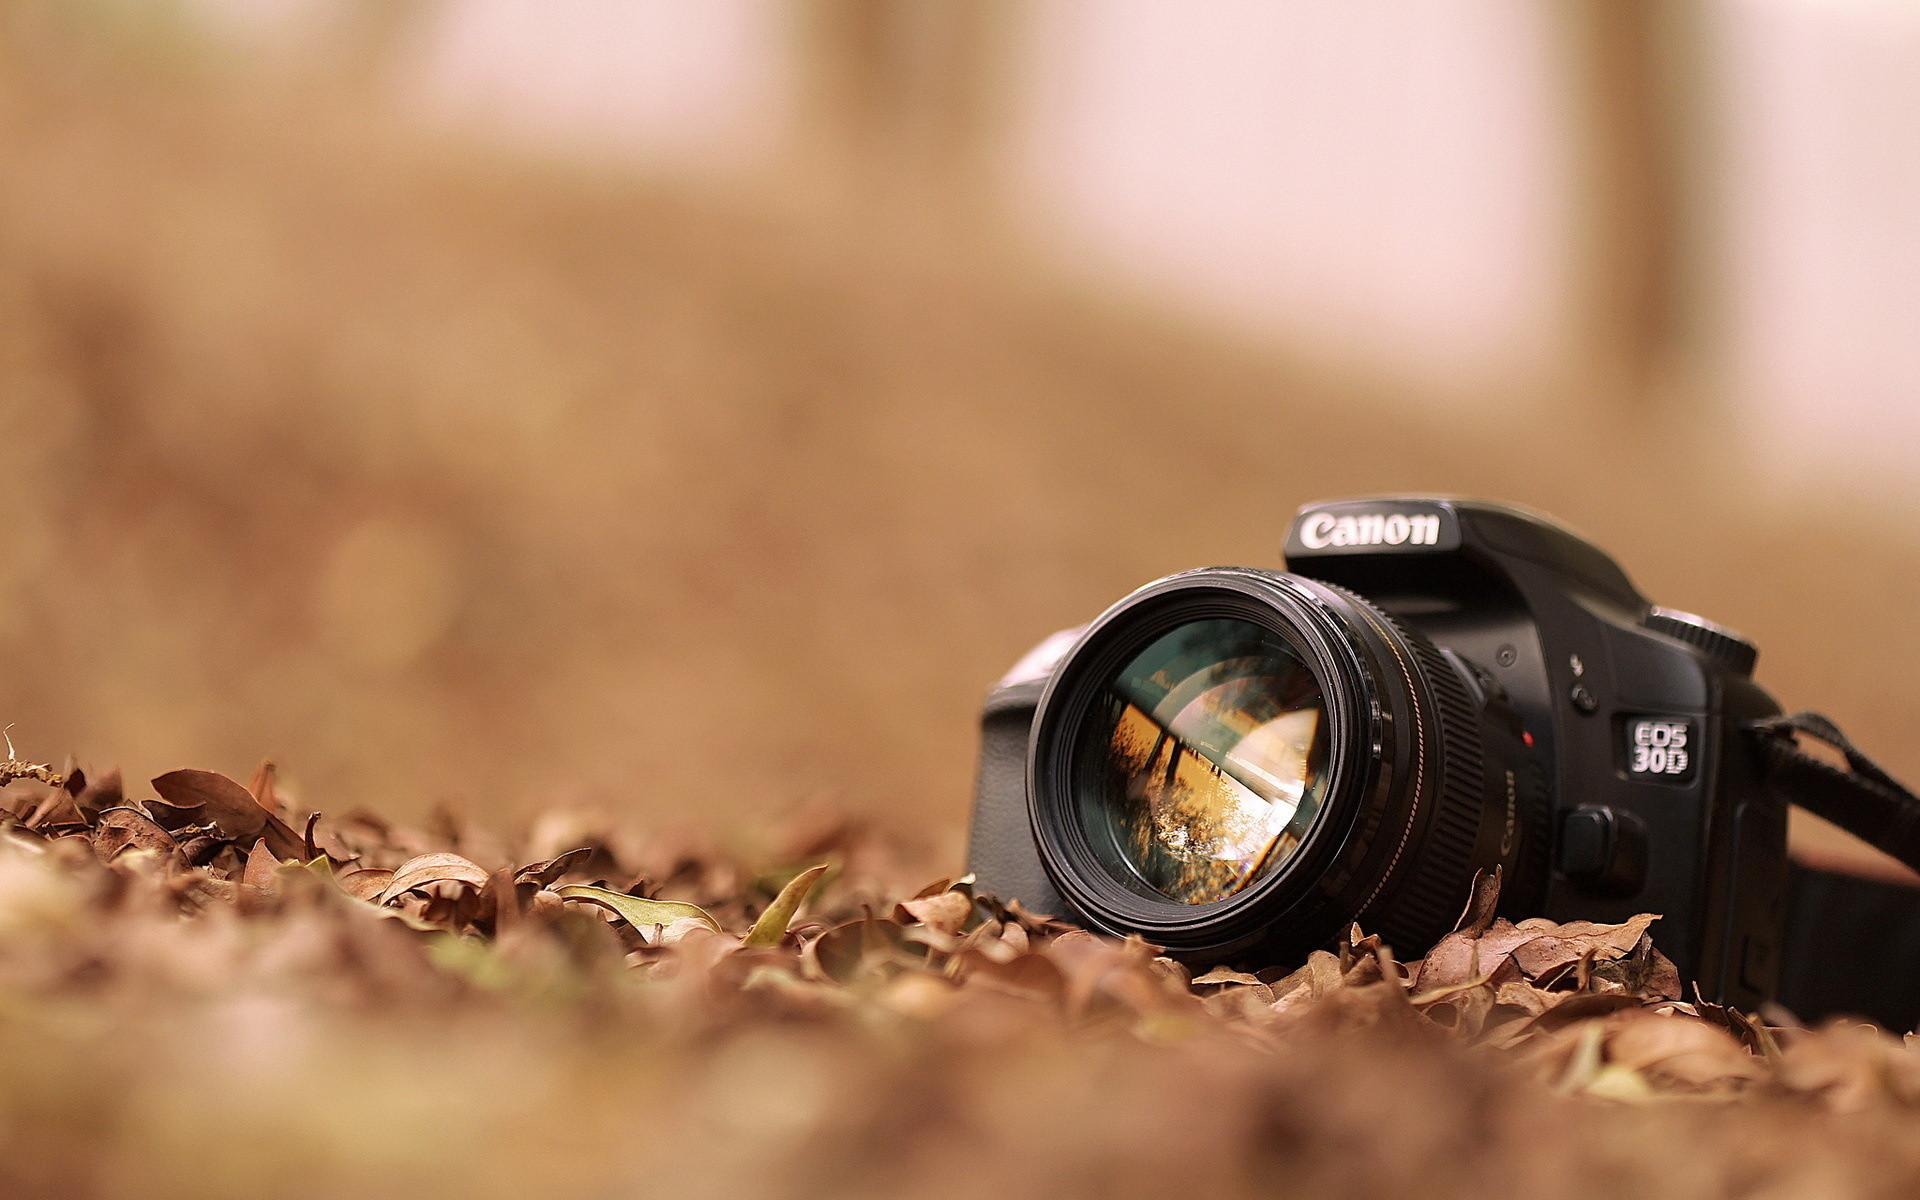 Canon Professional Camera HD resolution Wallpaper   Picture for 1920x1200